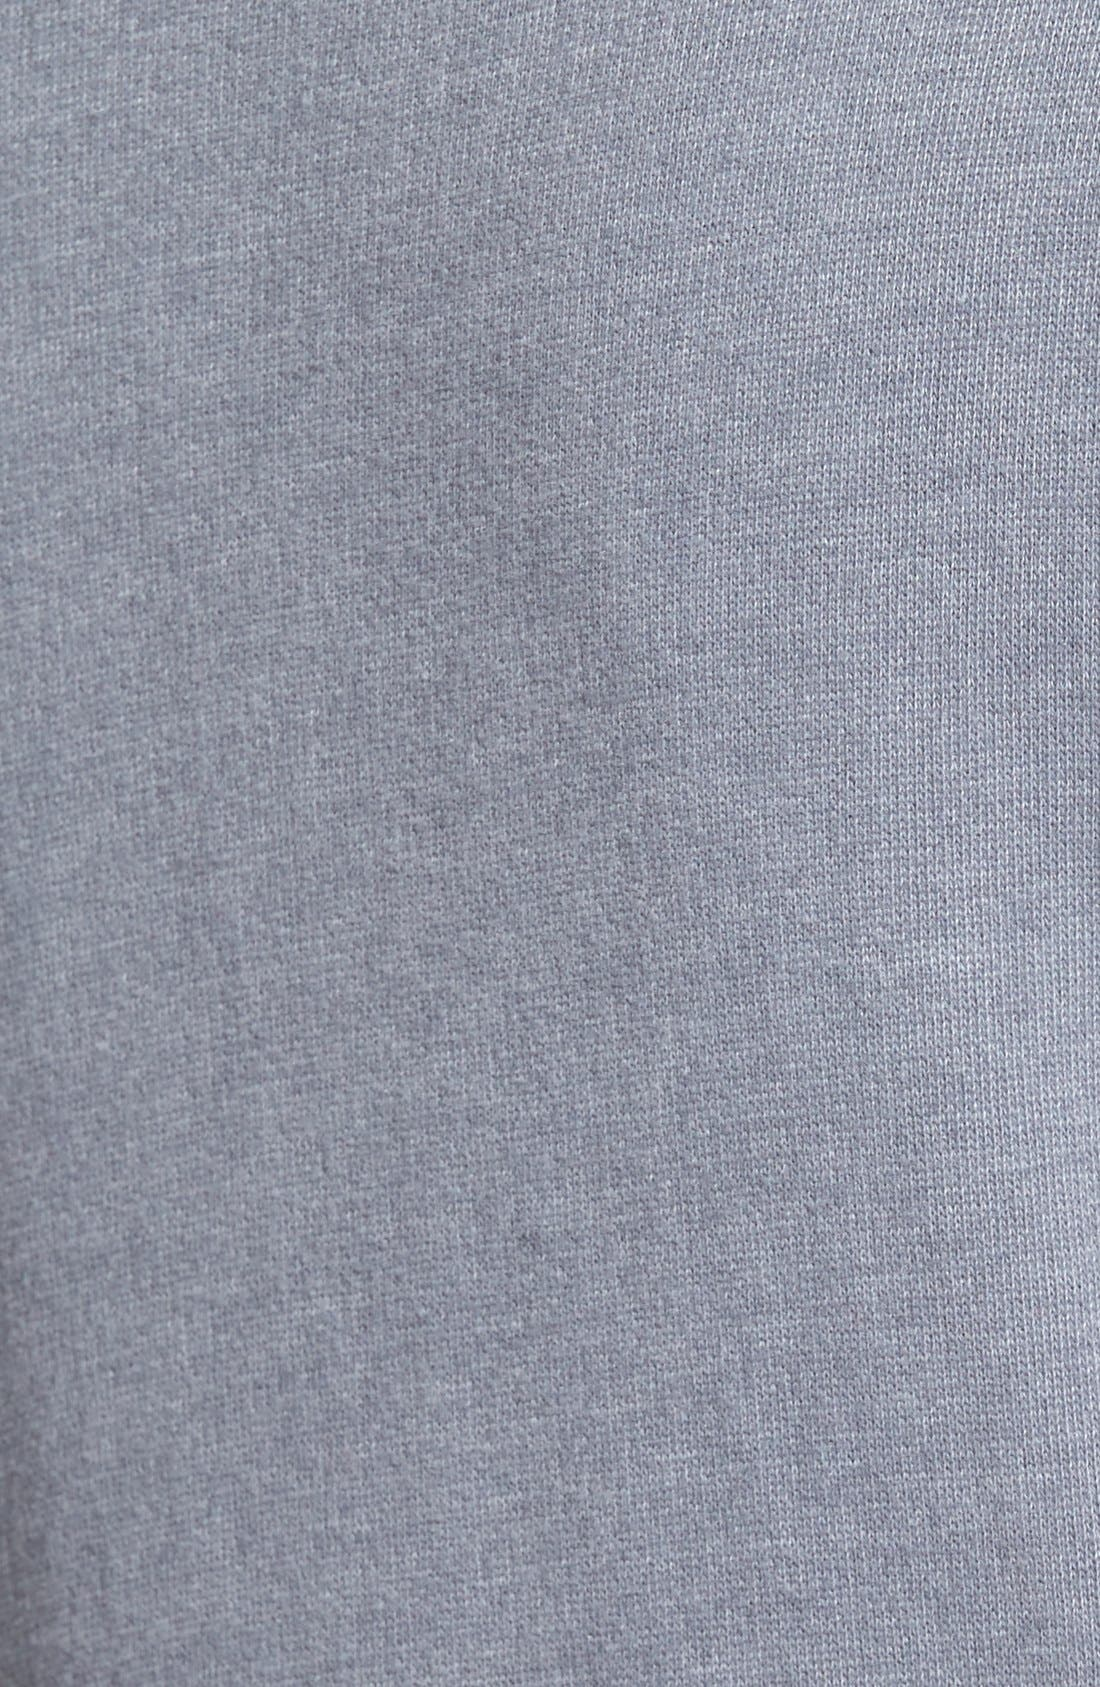 Asymmetrical Drape Collar Terry Jacket,                             Alternate thumbnail 8, color,                             GREY